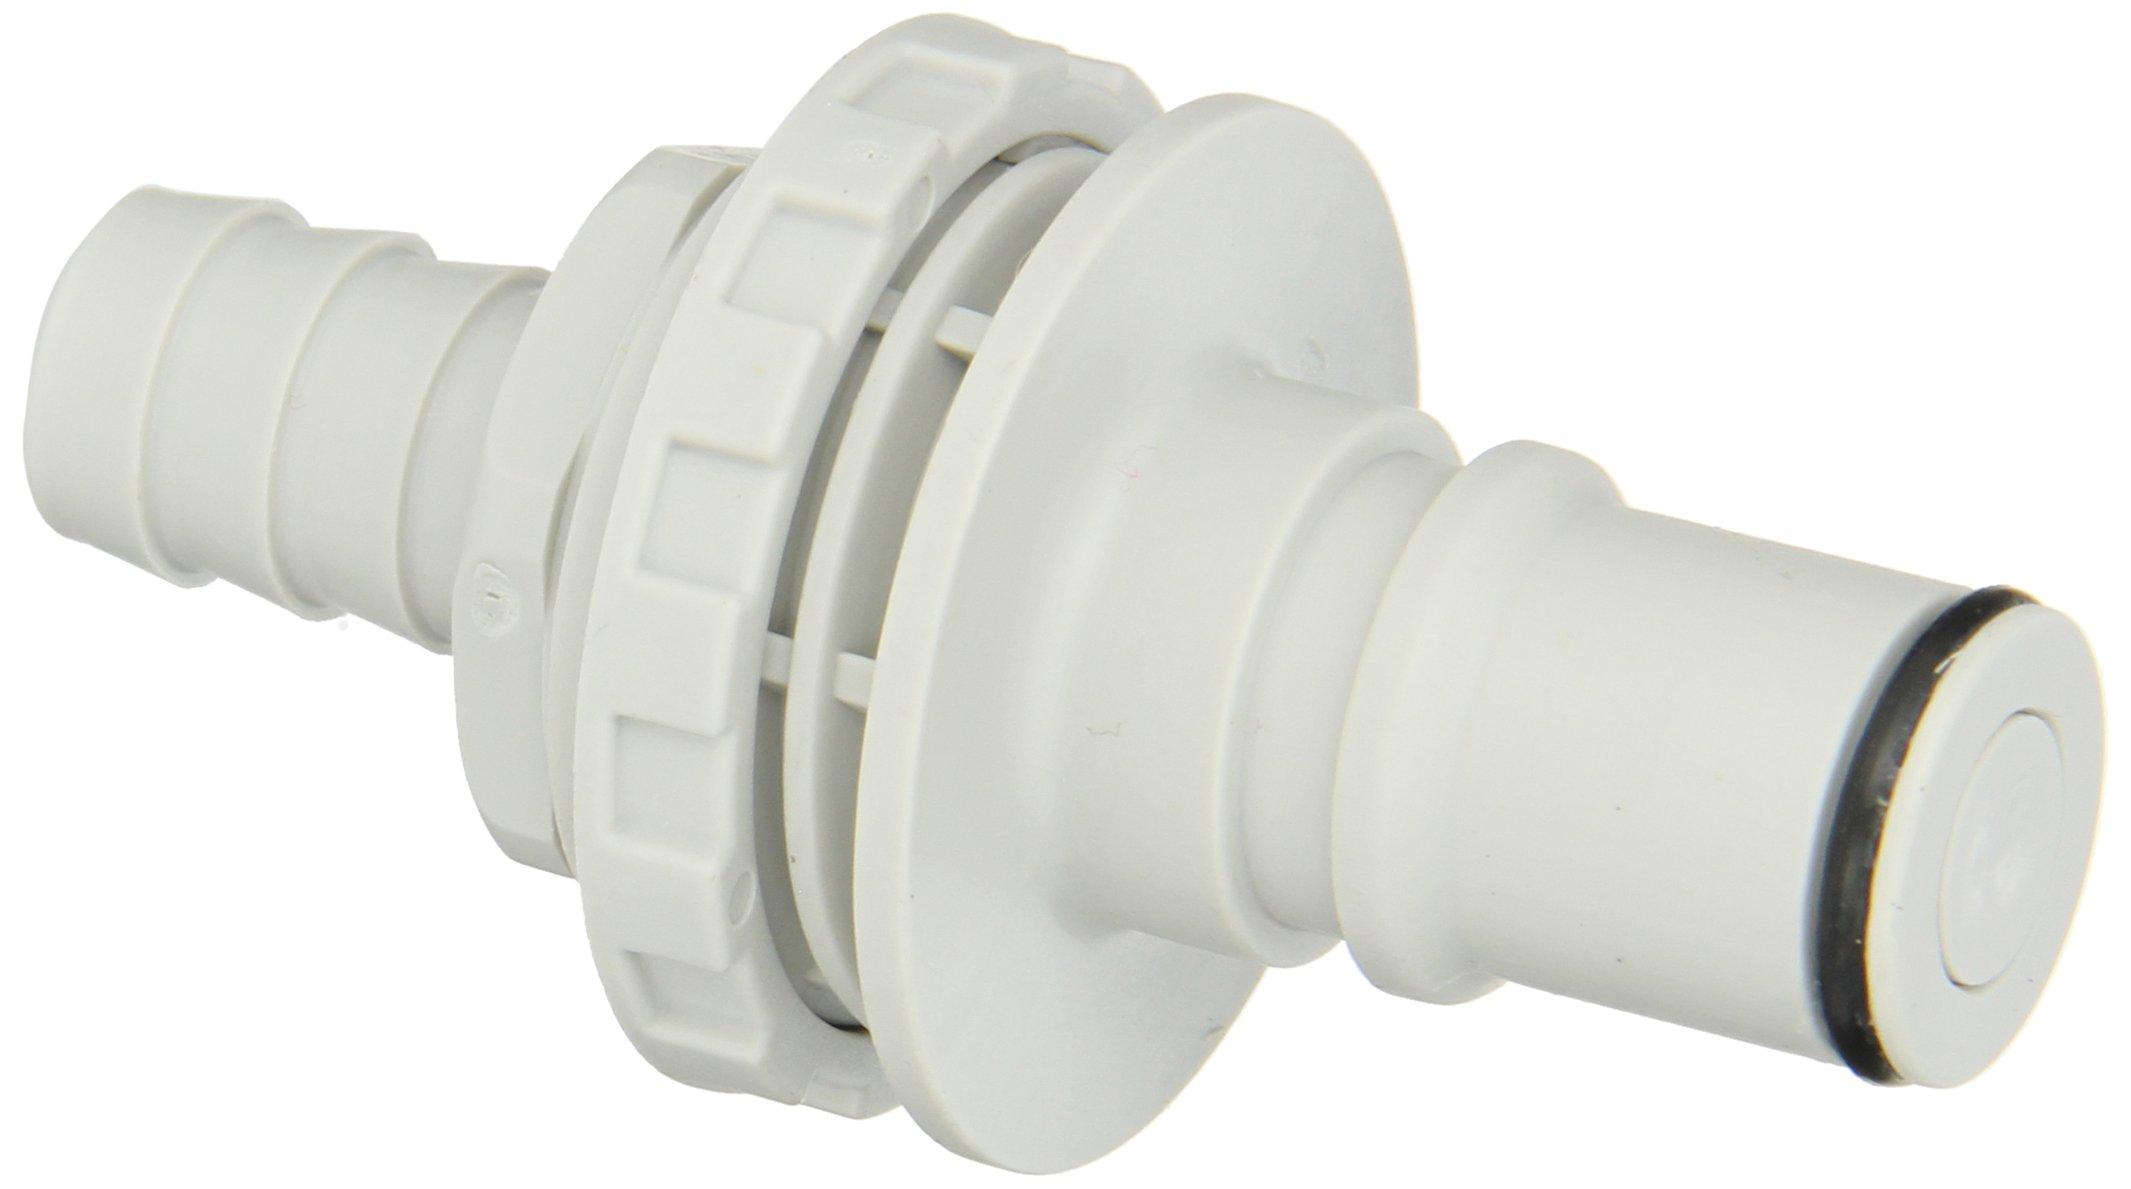 Colder NS6D42008 Polypropylene Tube Fitting, Insert, Shutoff, Panel Mount, 3/8'' Insert x 1/2'' Barb